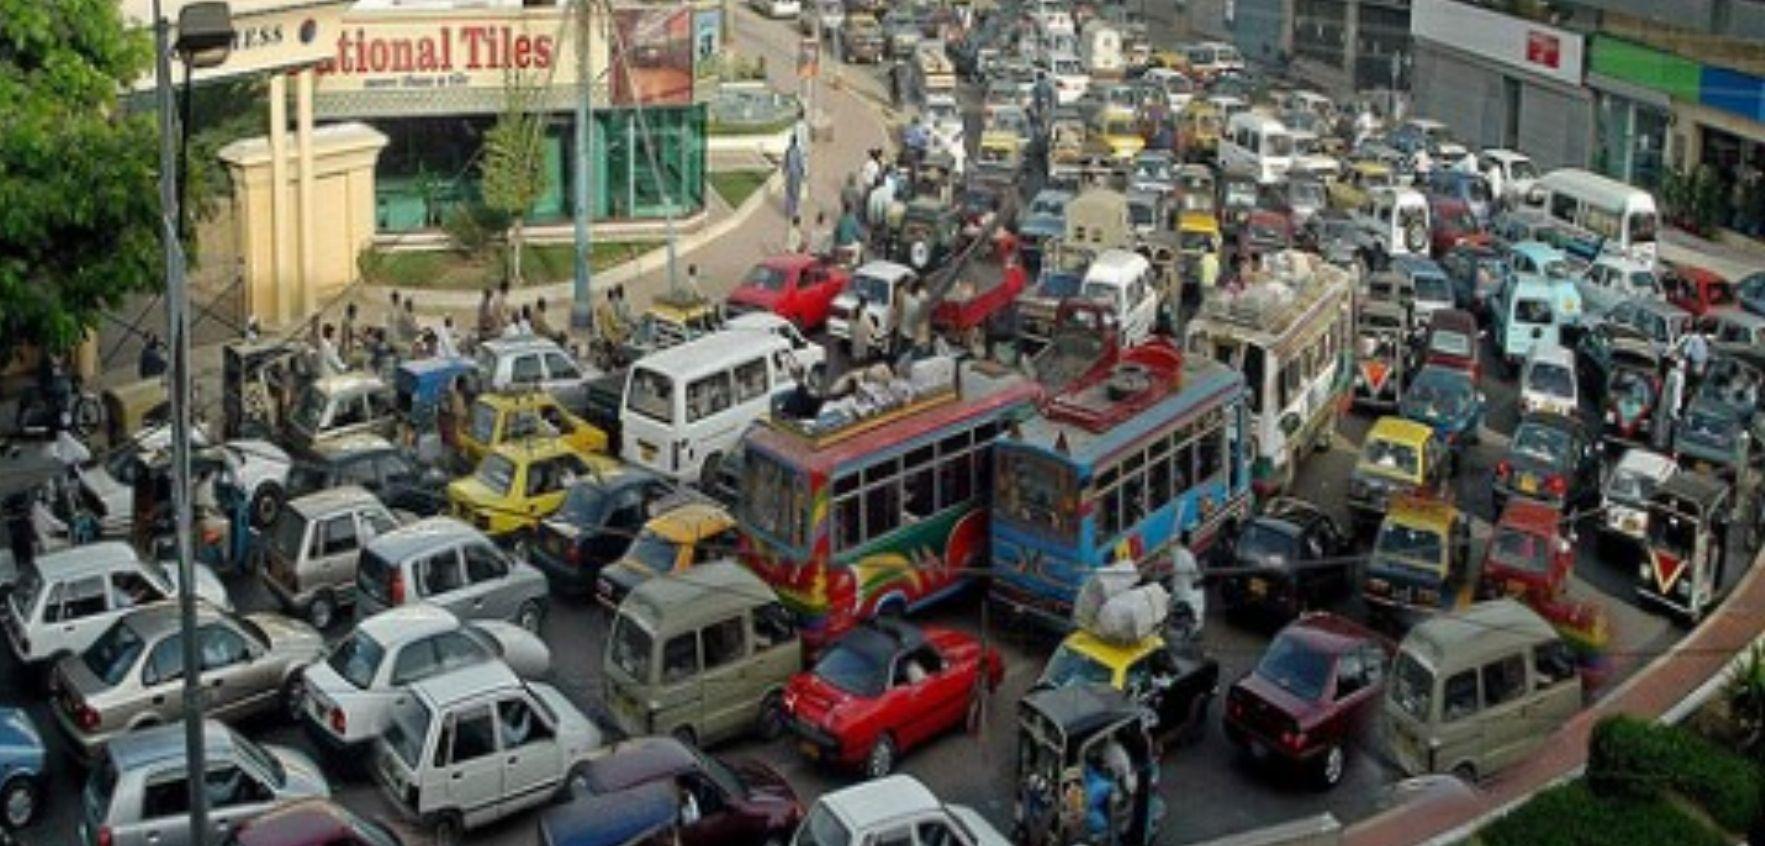 Karachi Typical Traffic Problems